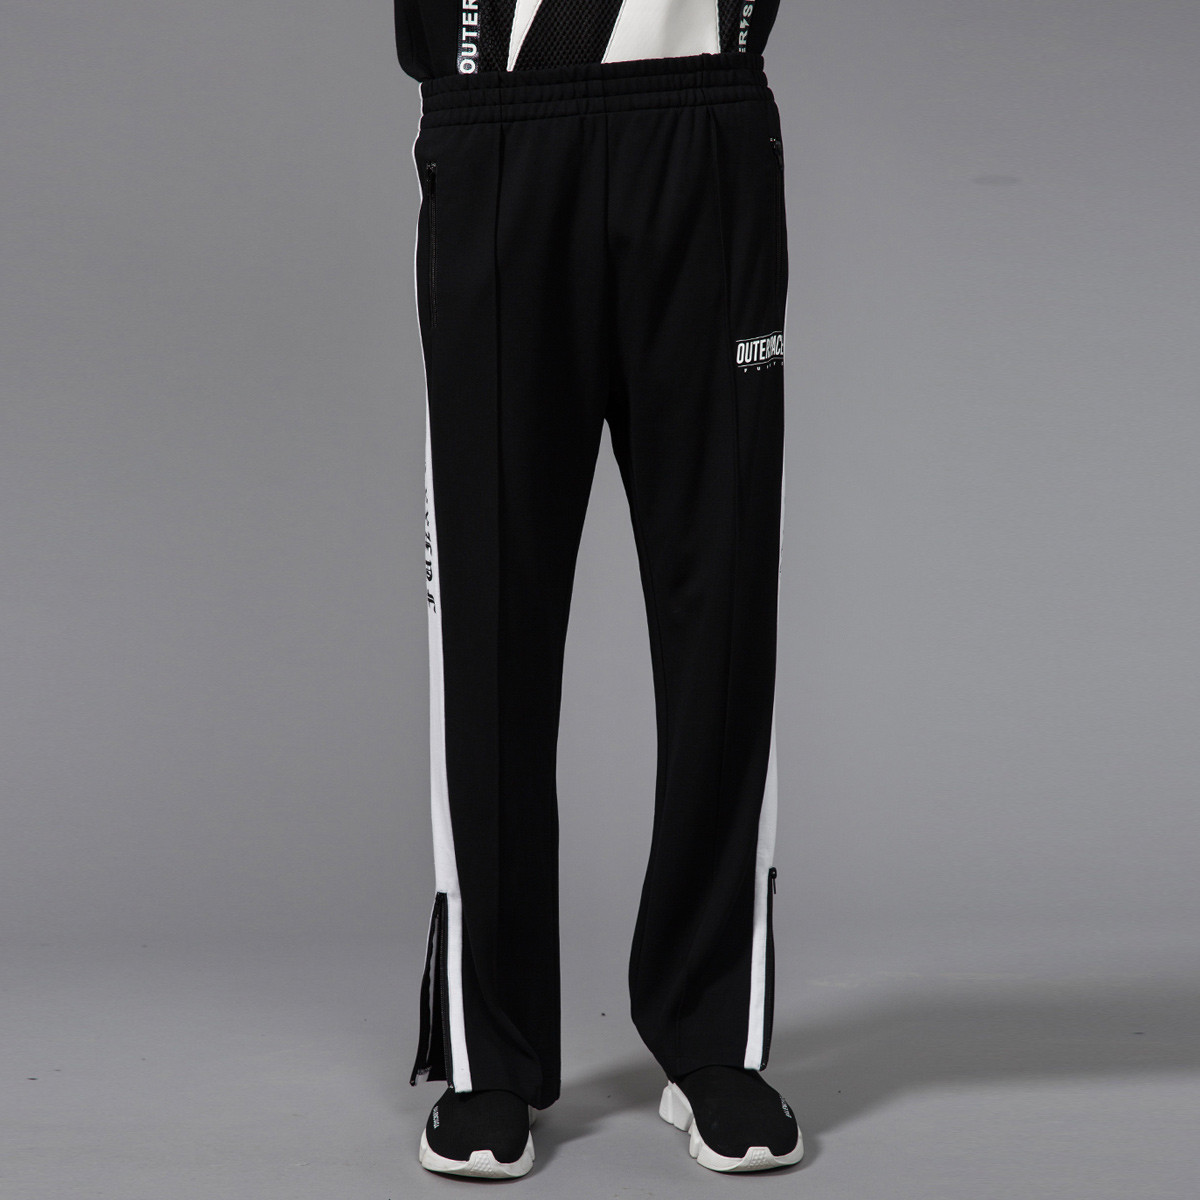 funFUN SPACE太空系列潮搭 男式裤针织长裤OK57666B0黑色